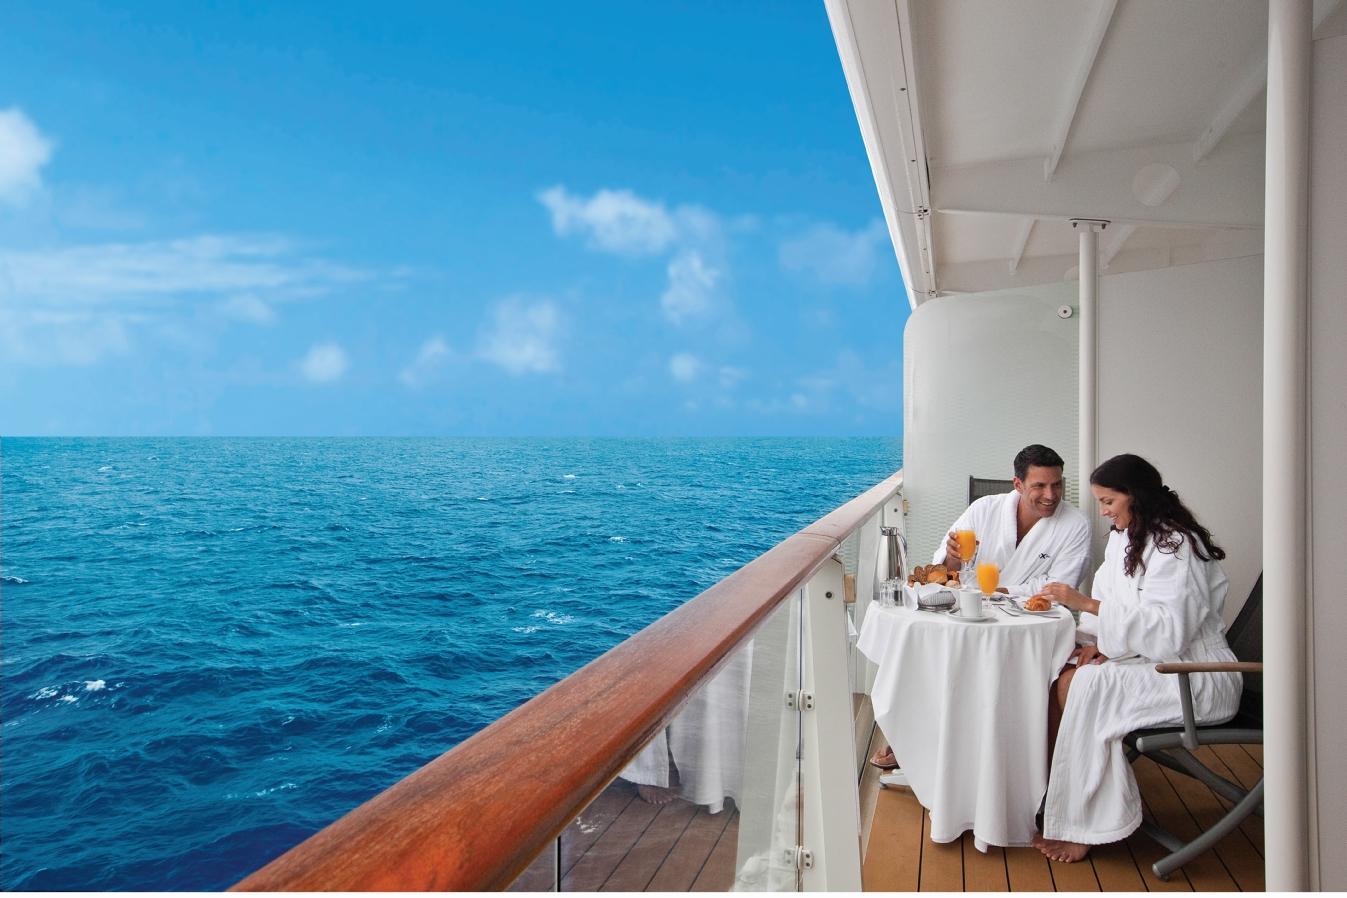 celebrity cruises navi di lusso